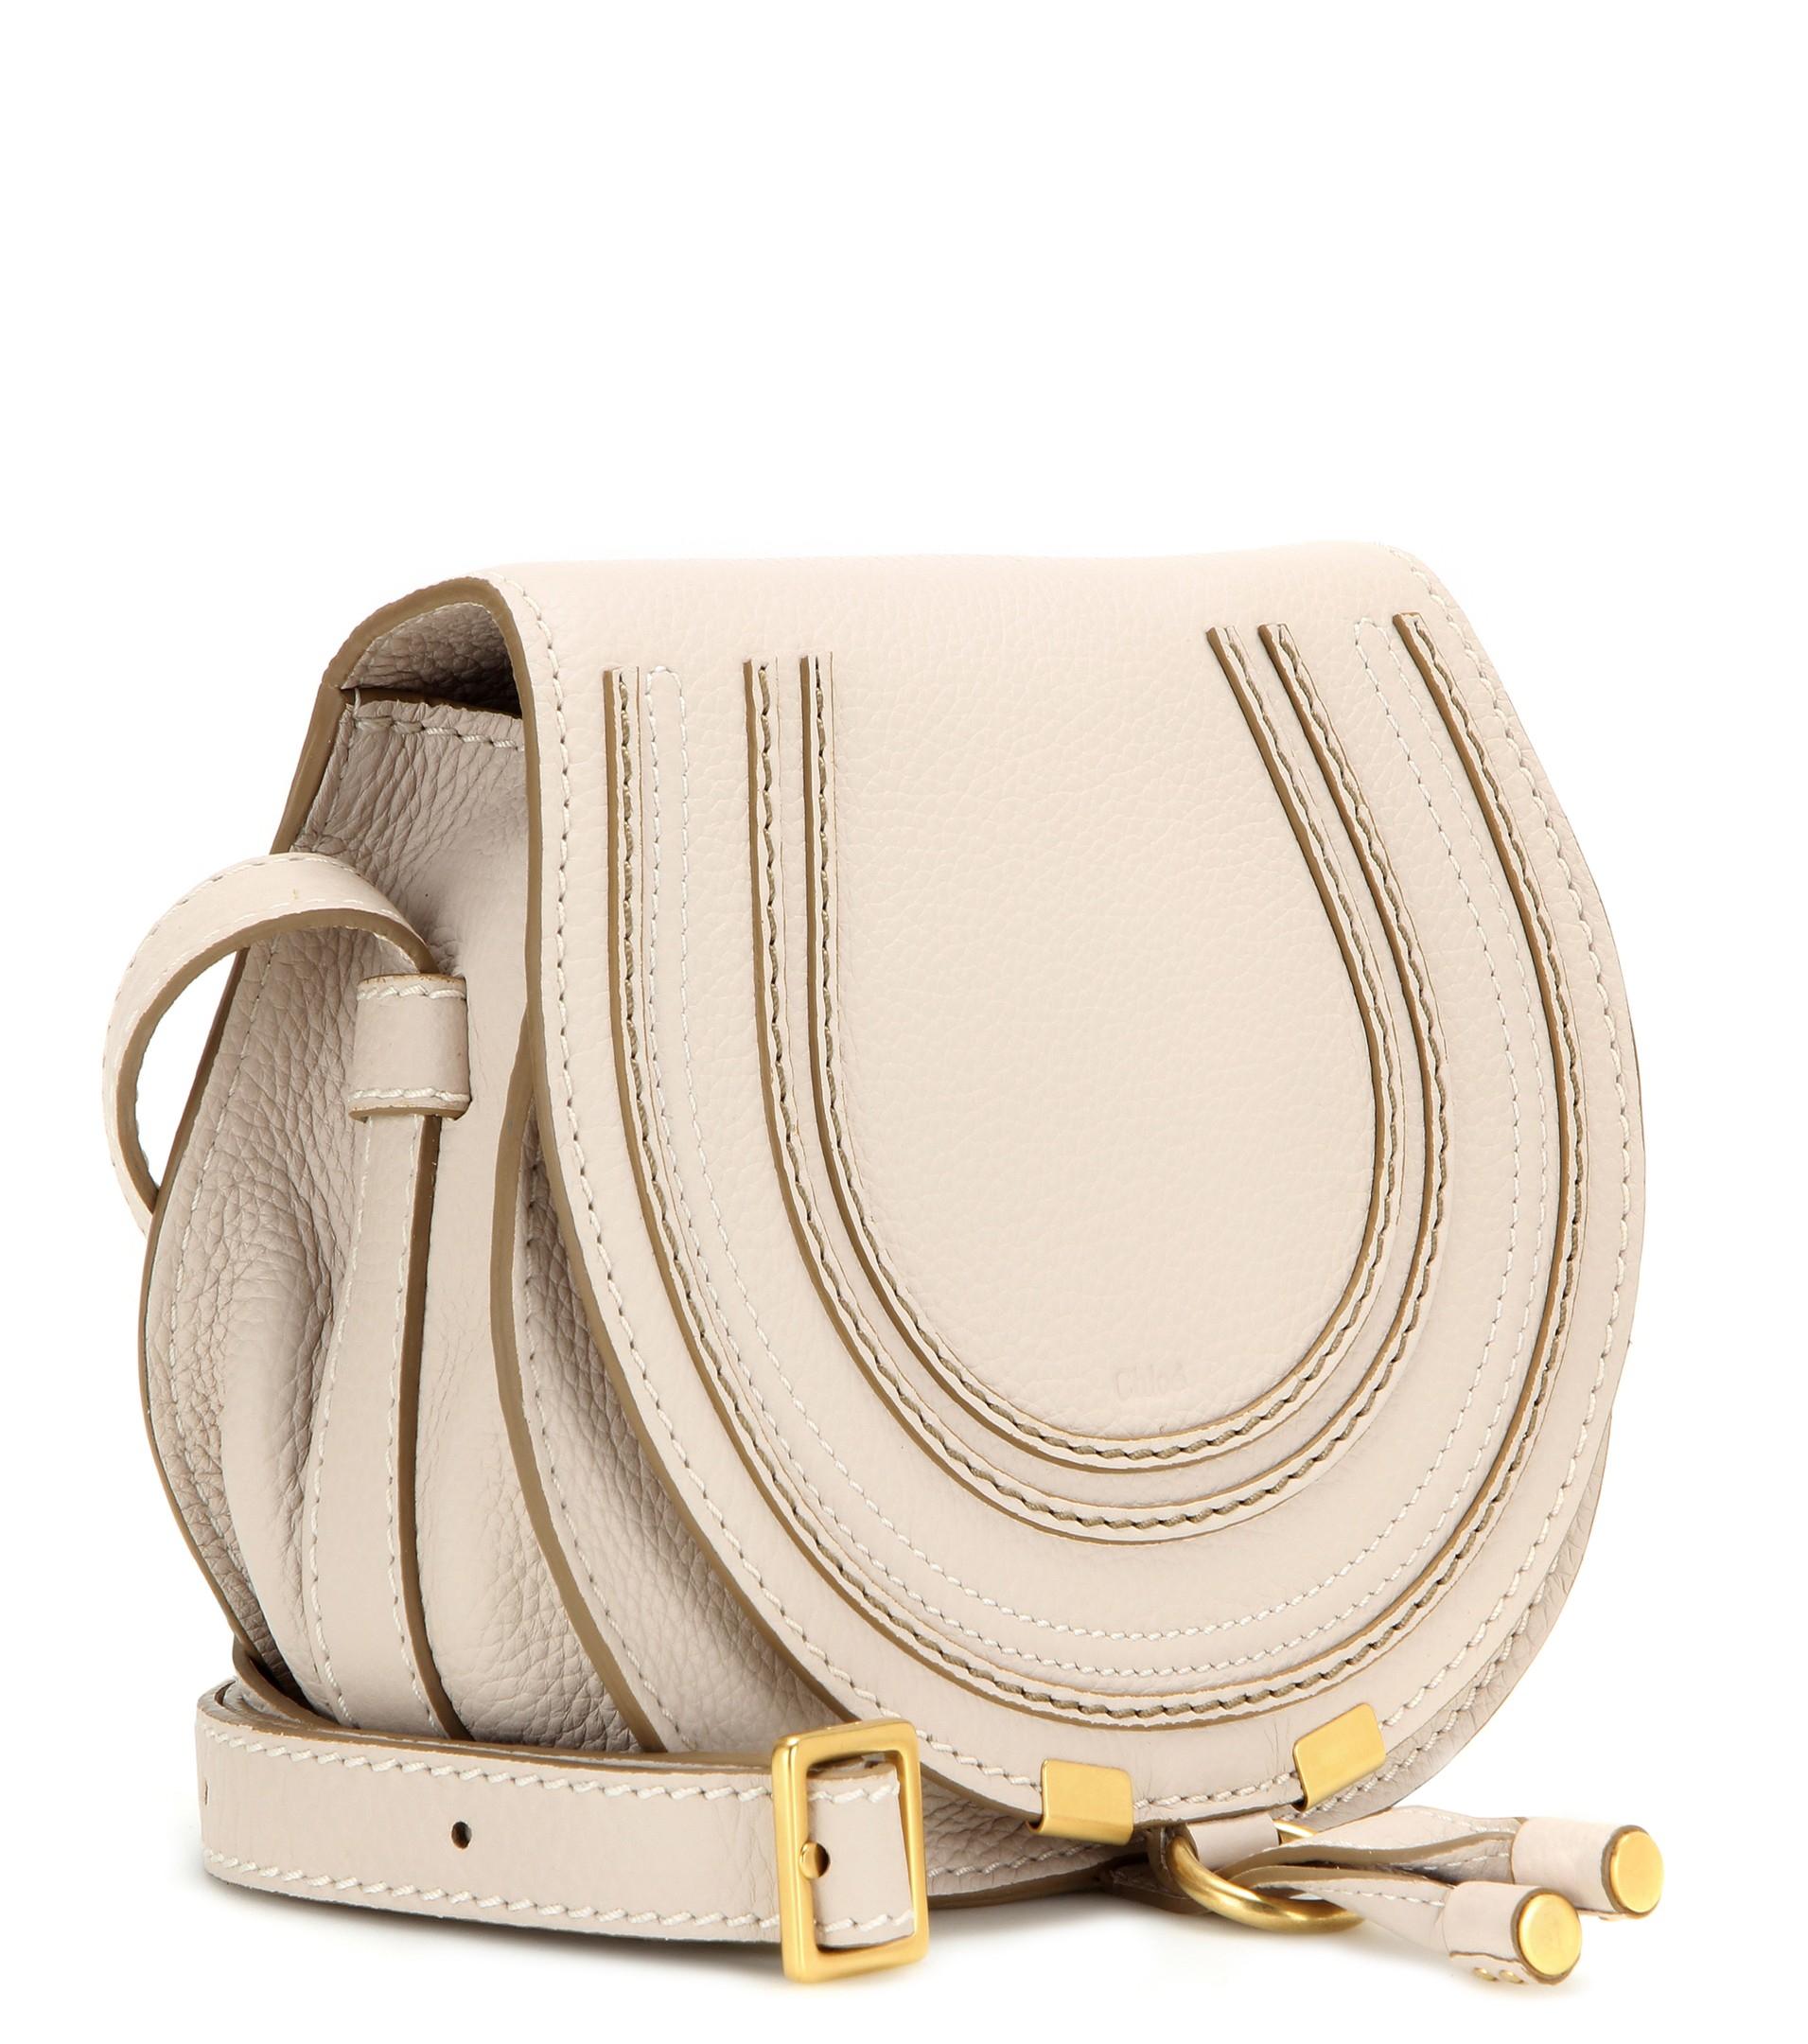 Chlo¨¦ Marcie Leather Shoulder Bag in Beige | Lyst